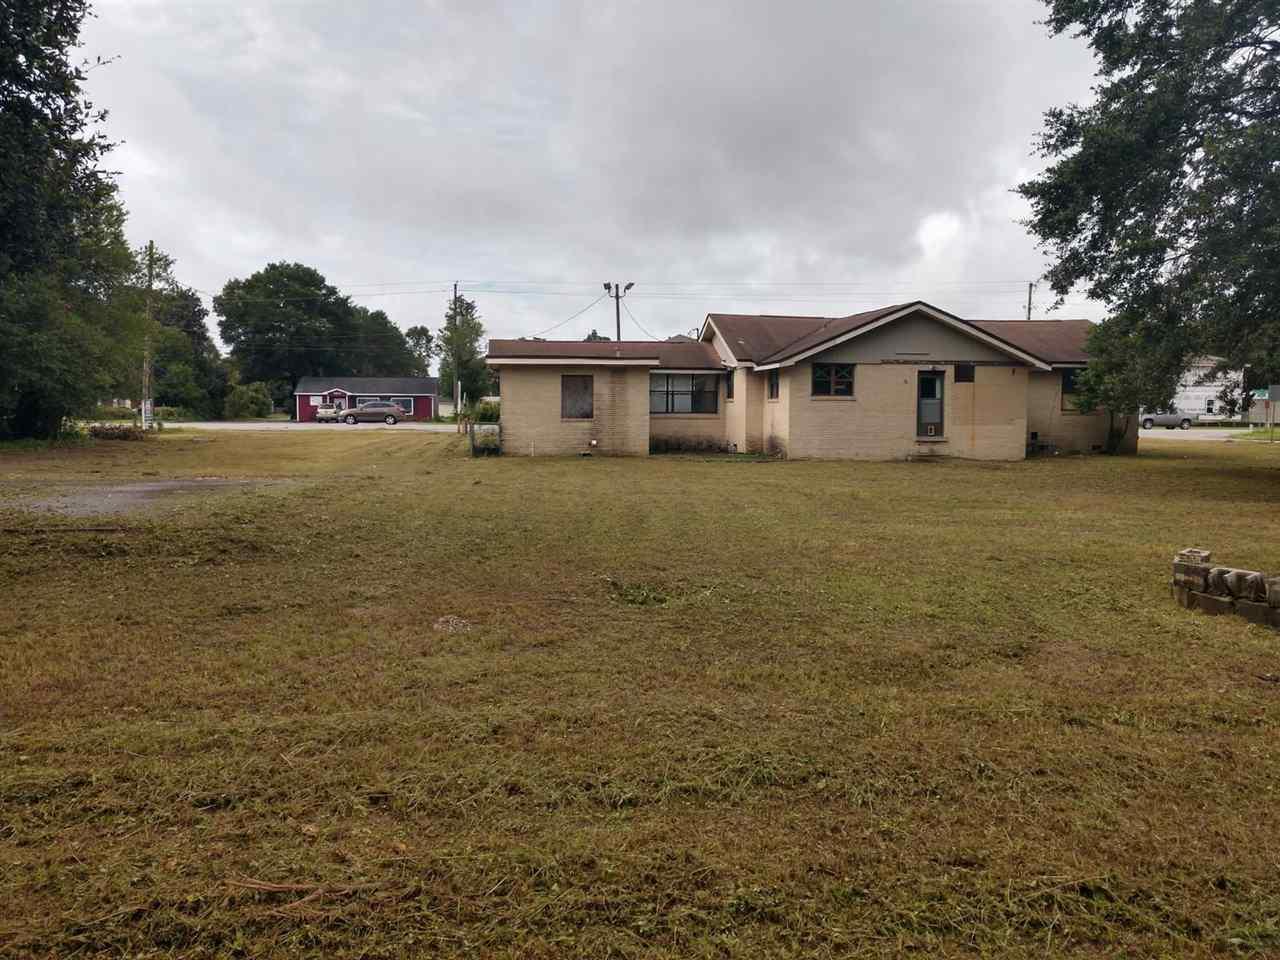 4601 Saufley Field Rd, Pensacola, FL 32526